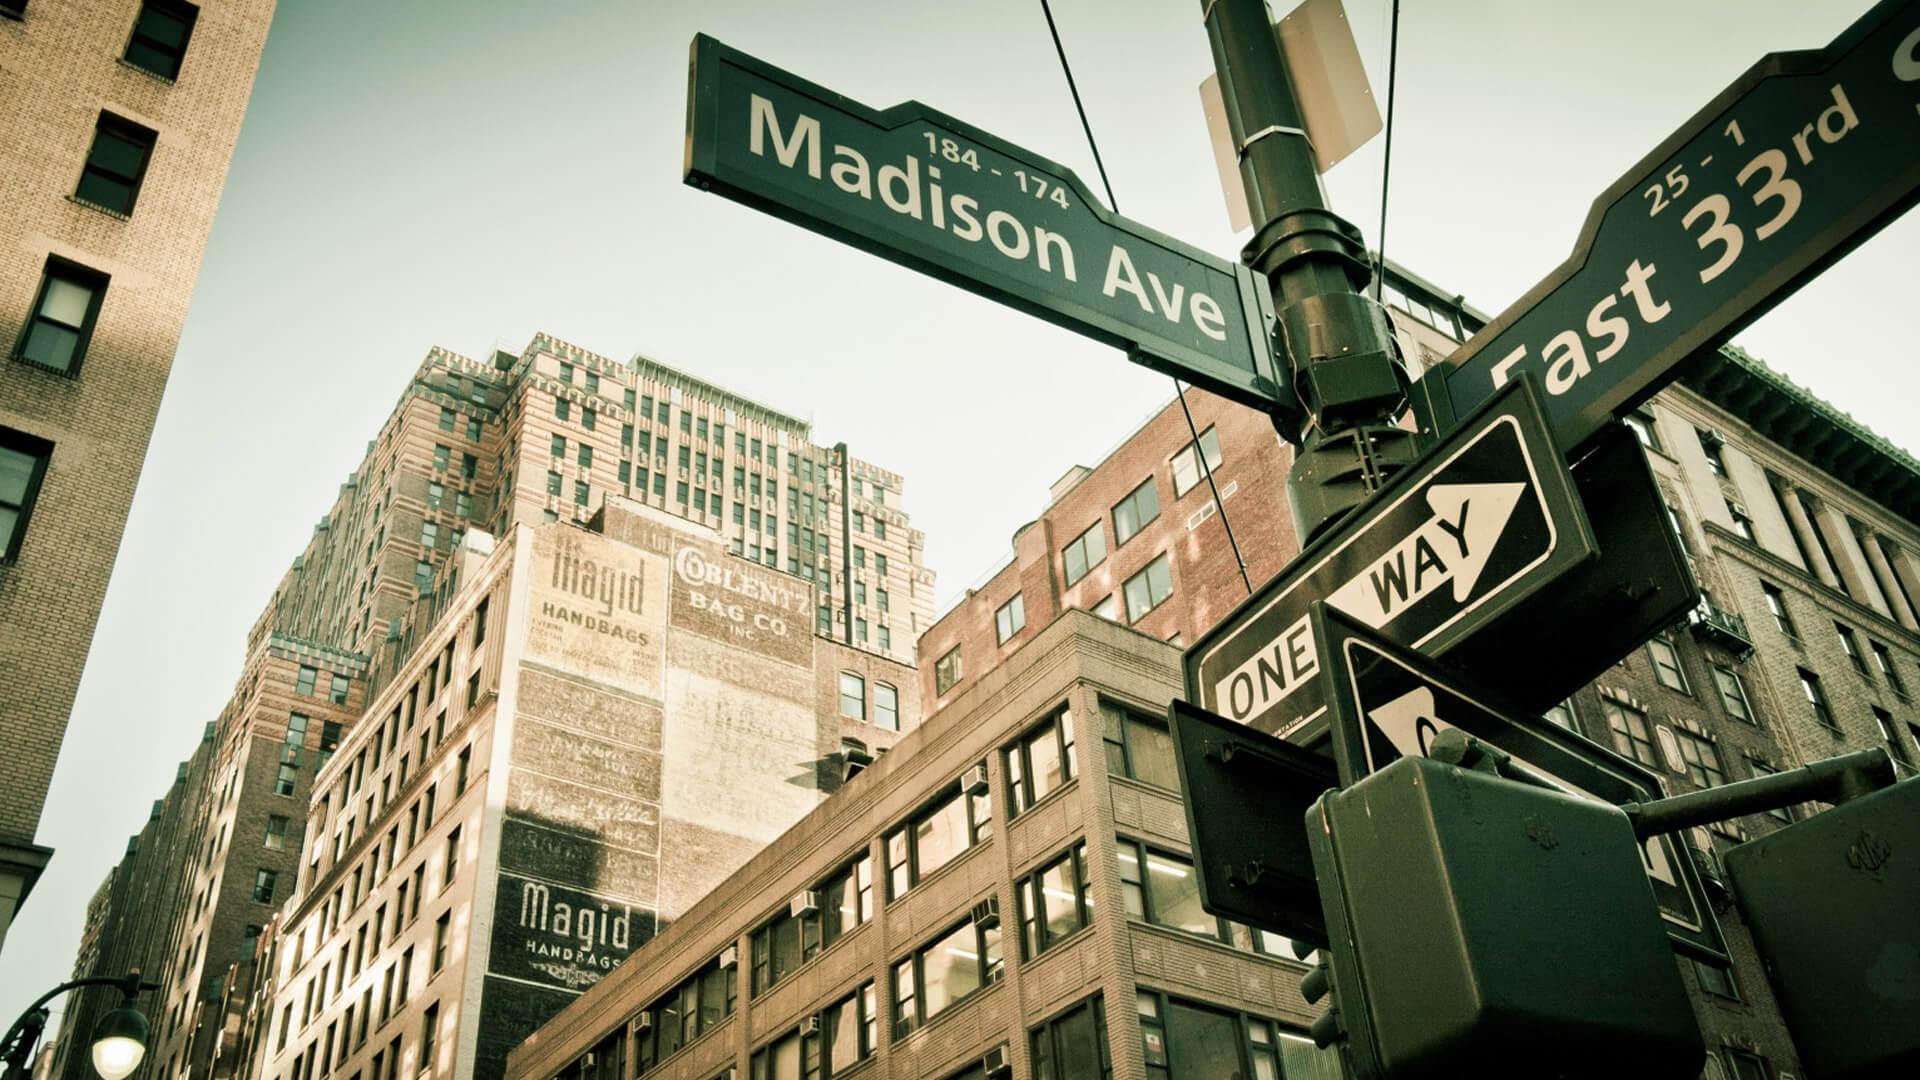 Agência Madison (@agenciamadison) Cover Image